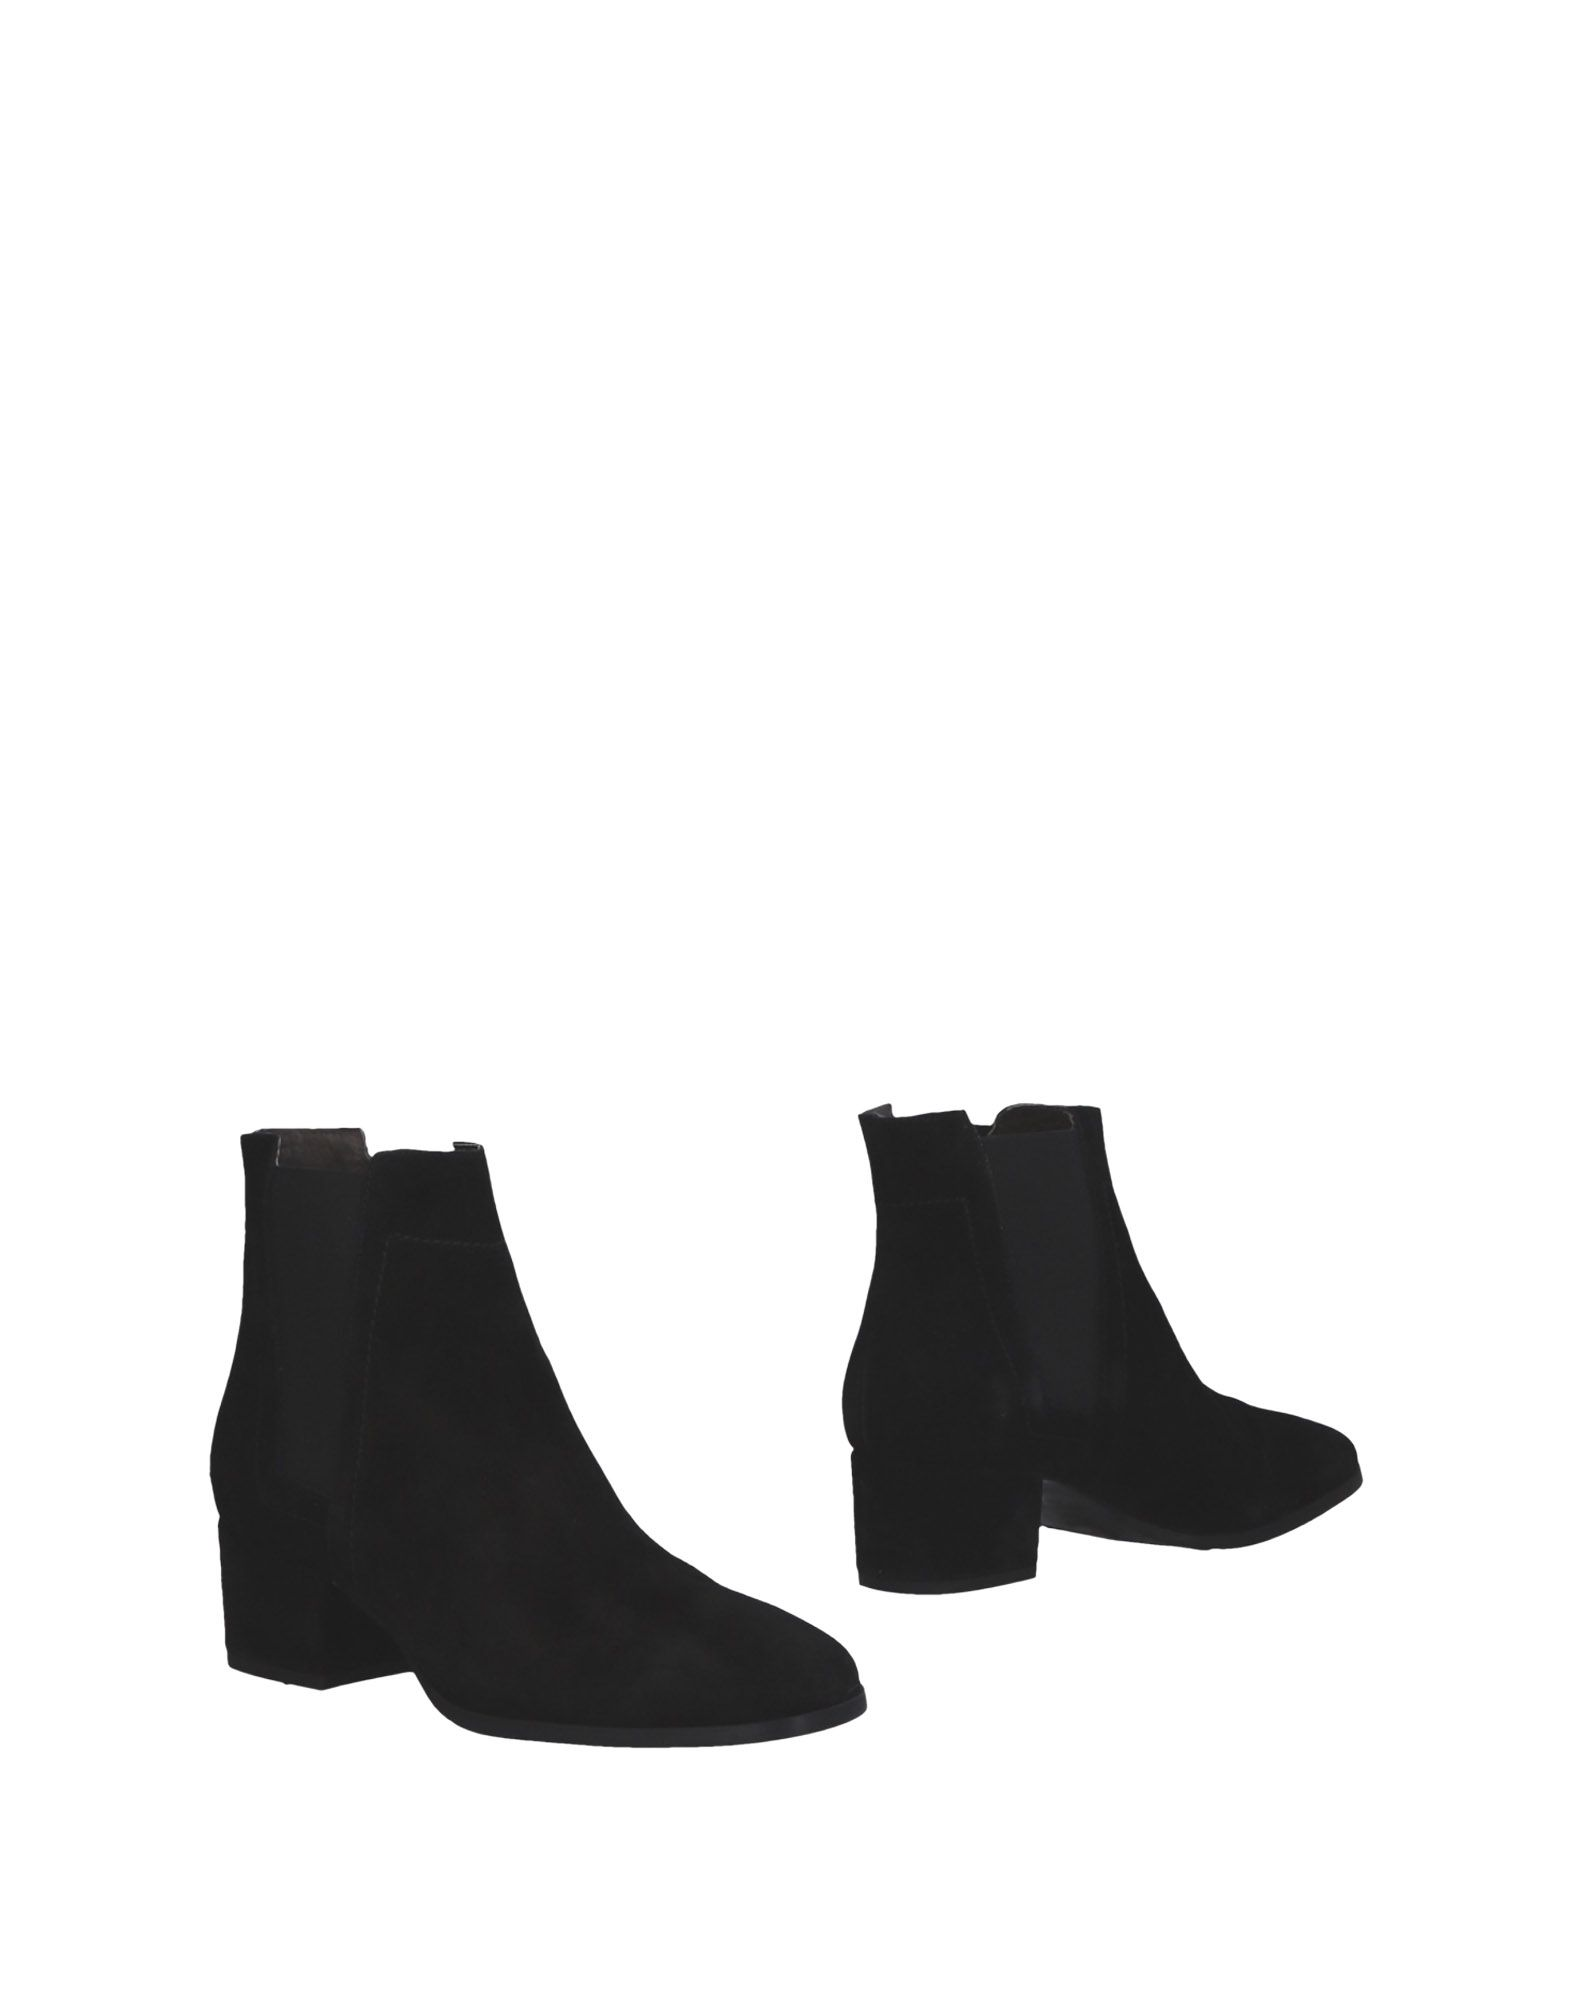 Paola Ferri Paola Ankle Boot - Women Paola Ferri Ferri Ankle Boots online on  United Kingdom - 11475960WU b75dc0